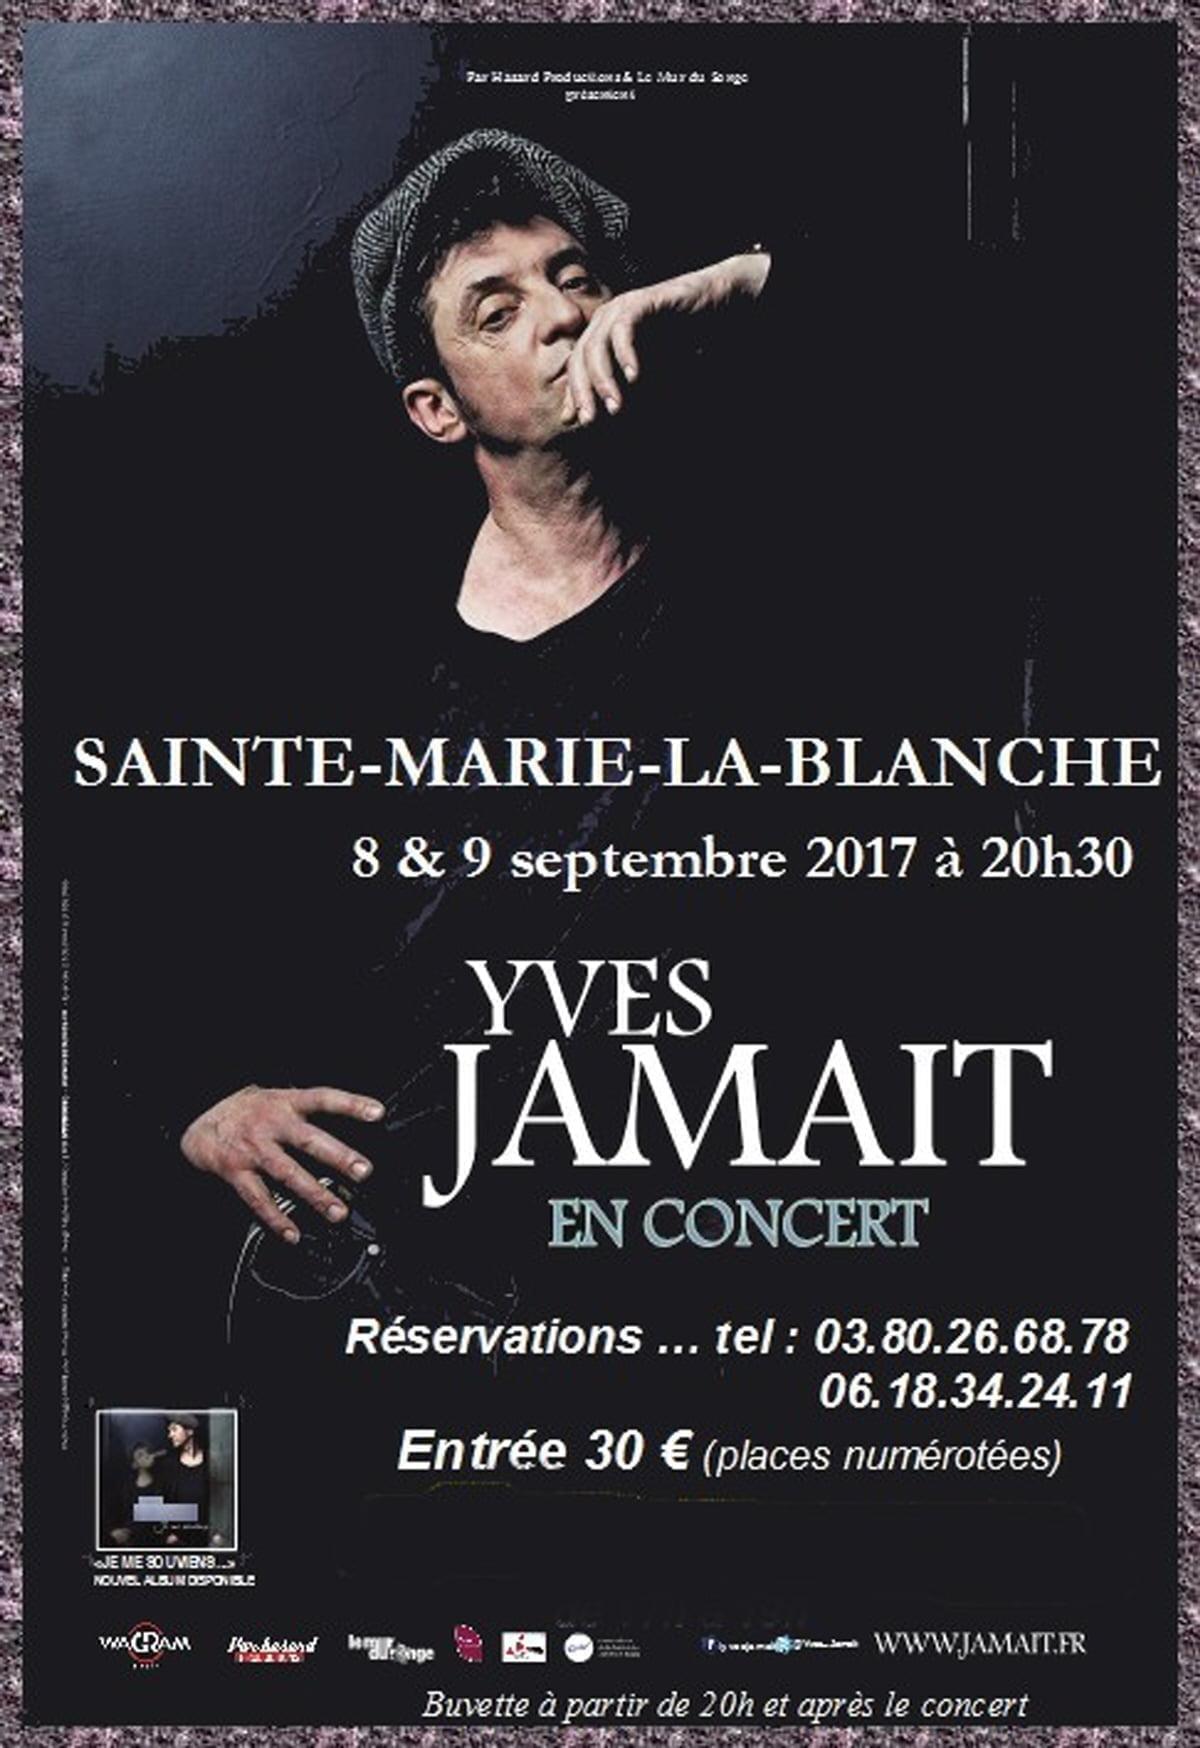 Concert Sainte marie